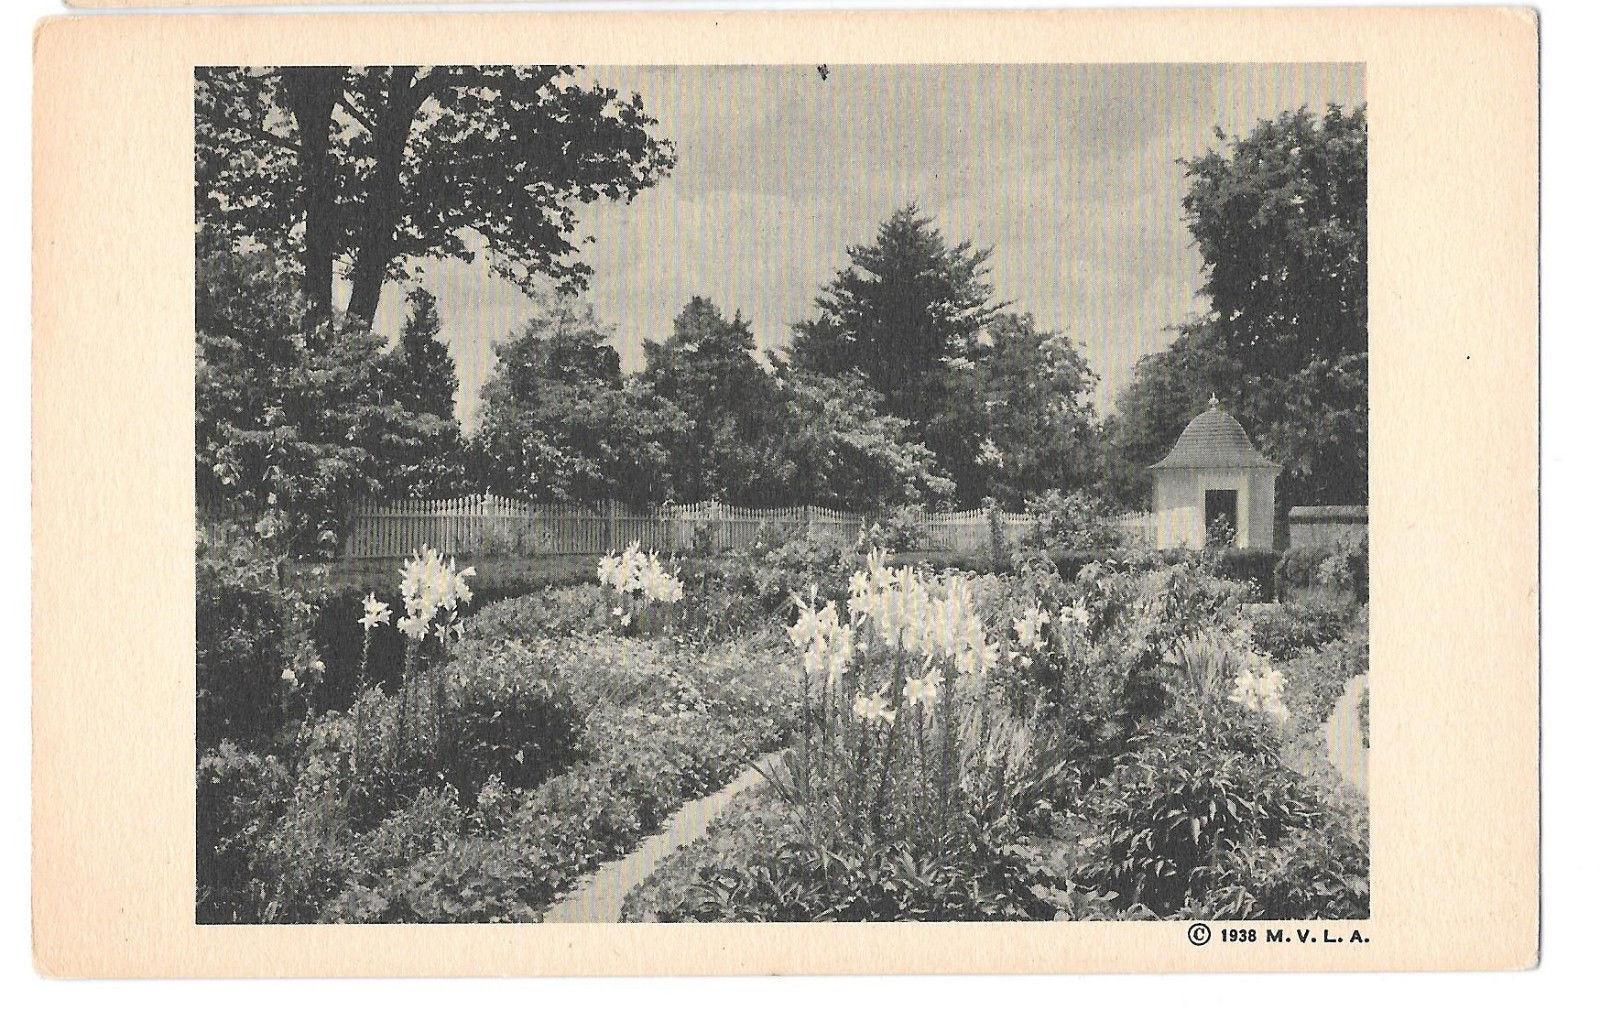 VA Mount Vernon Flower Garden Lilies George Washington Vtg Postcard 1938 MVLA